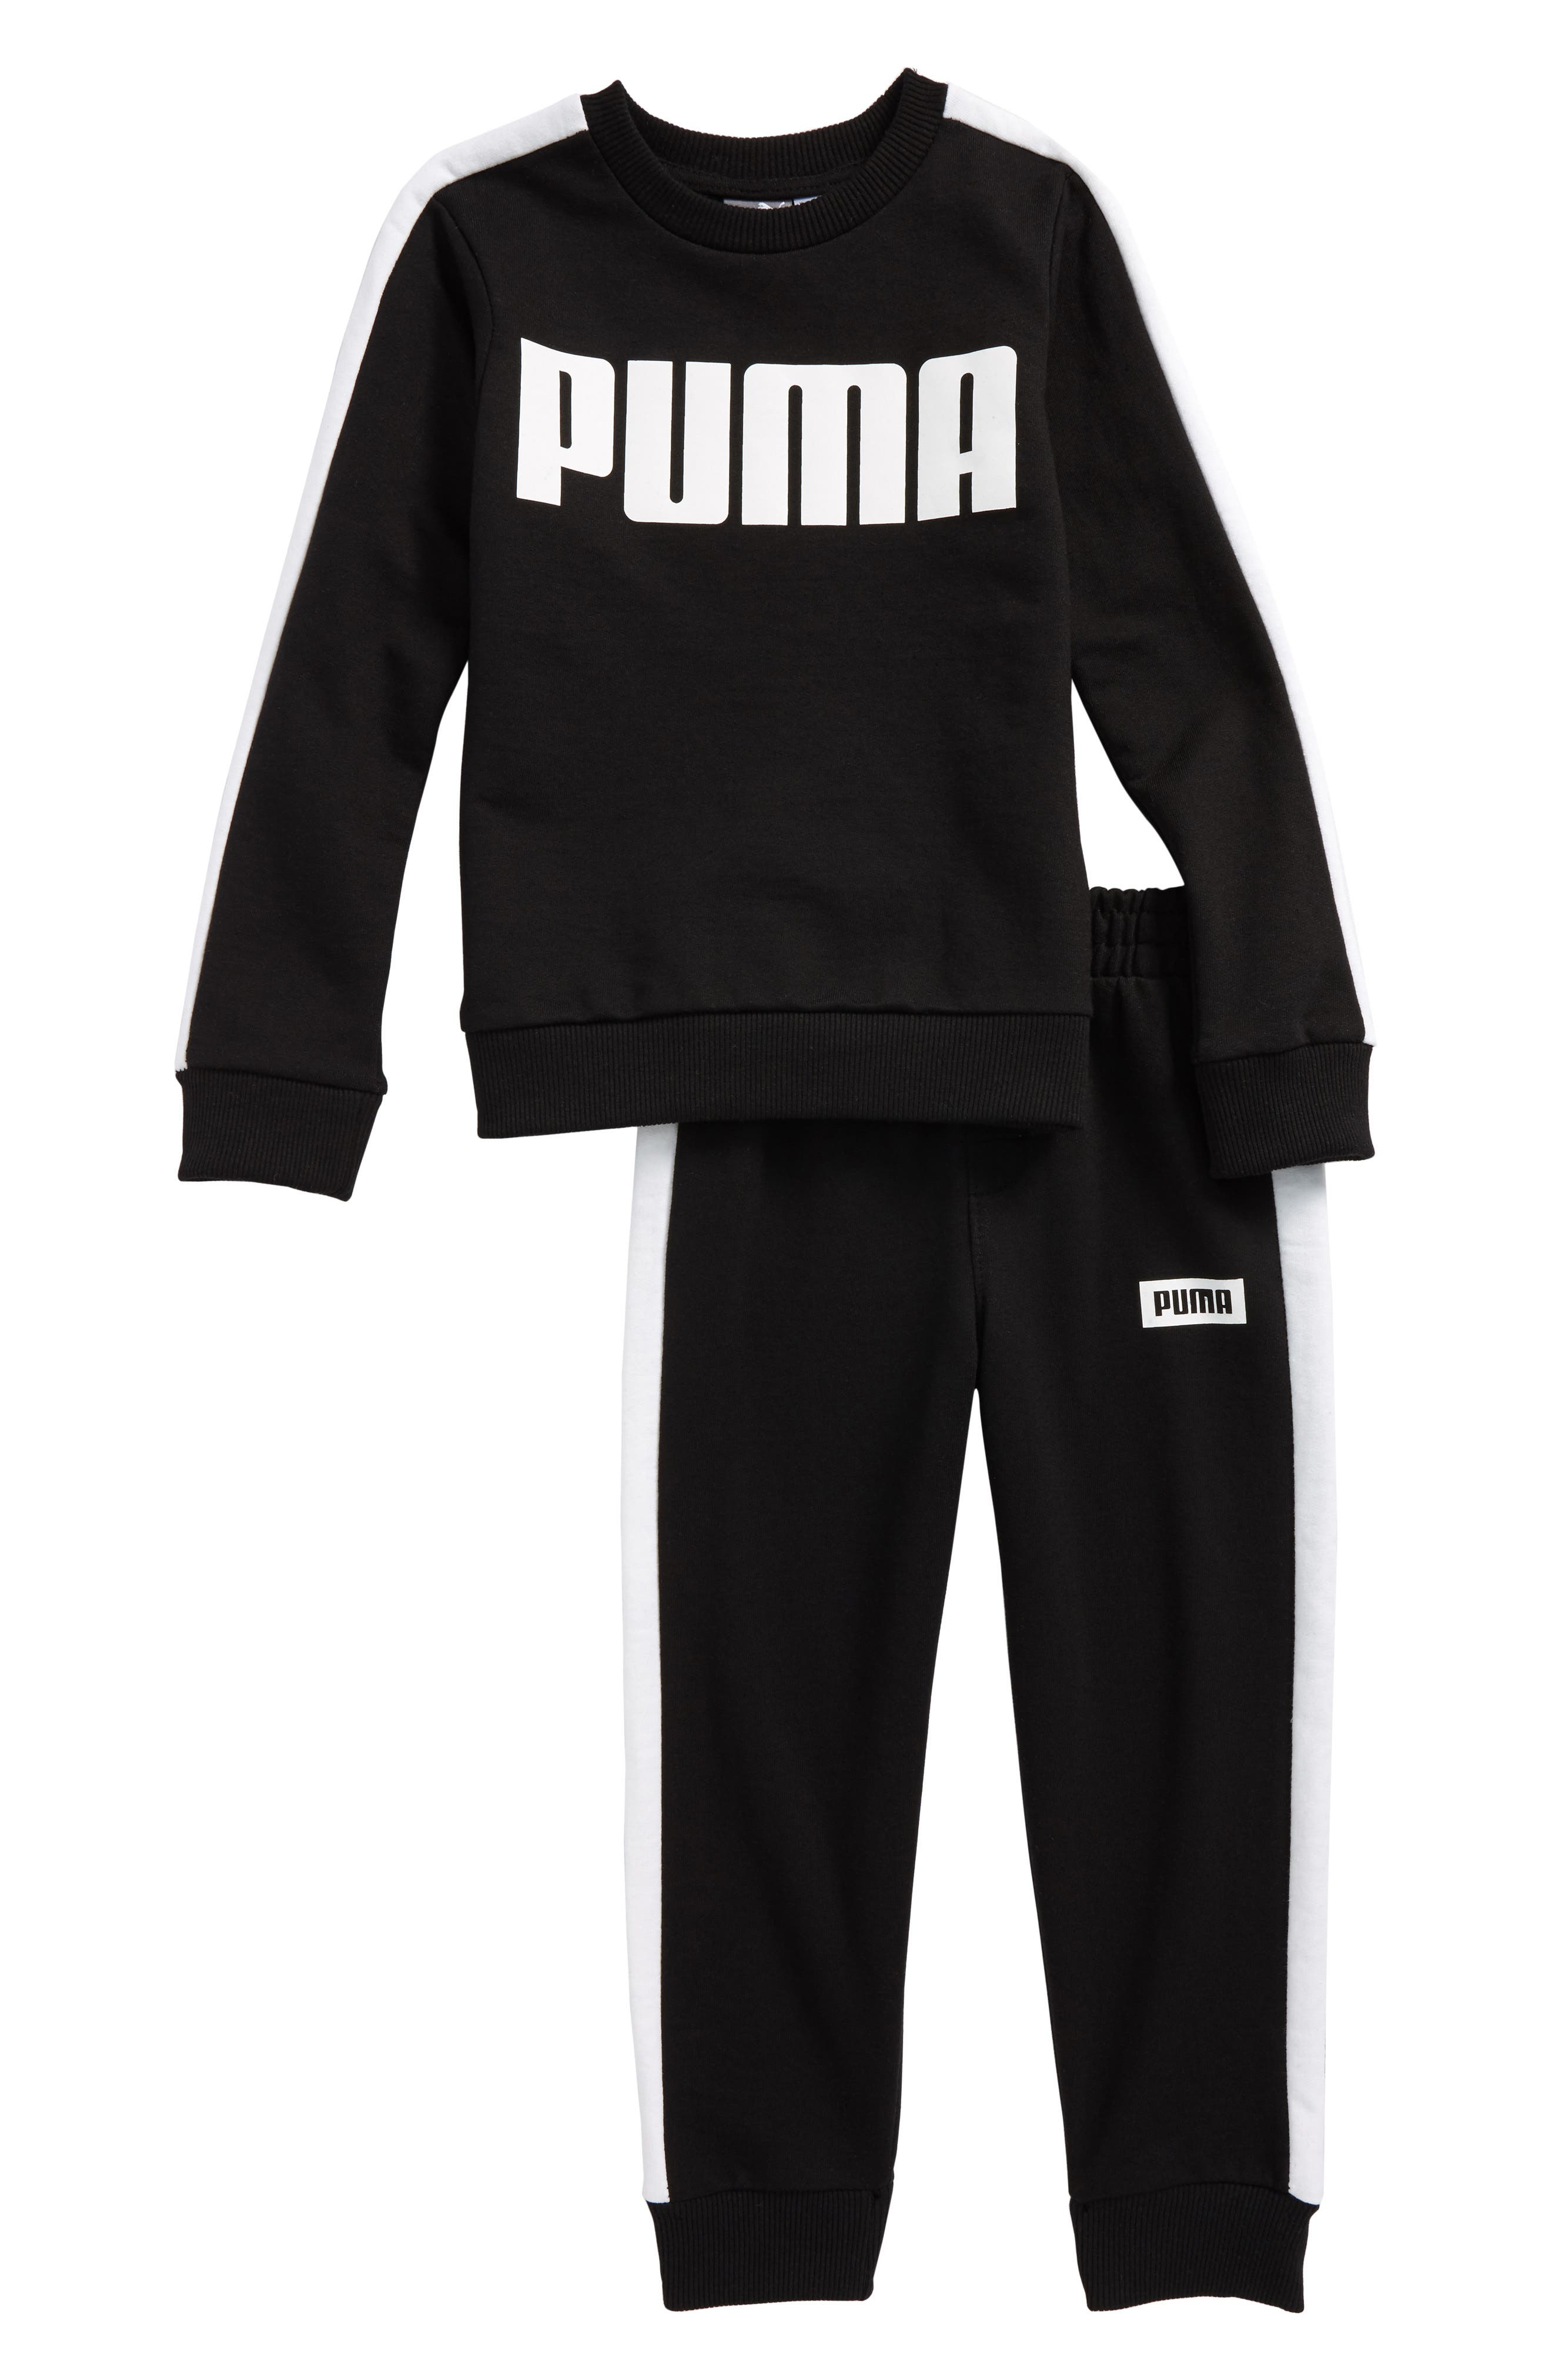 Main Image - PUMA Rebel Logo Sweatshirt & Sweatpants Set (Toddler Boys & Little Boys)